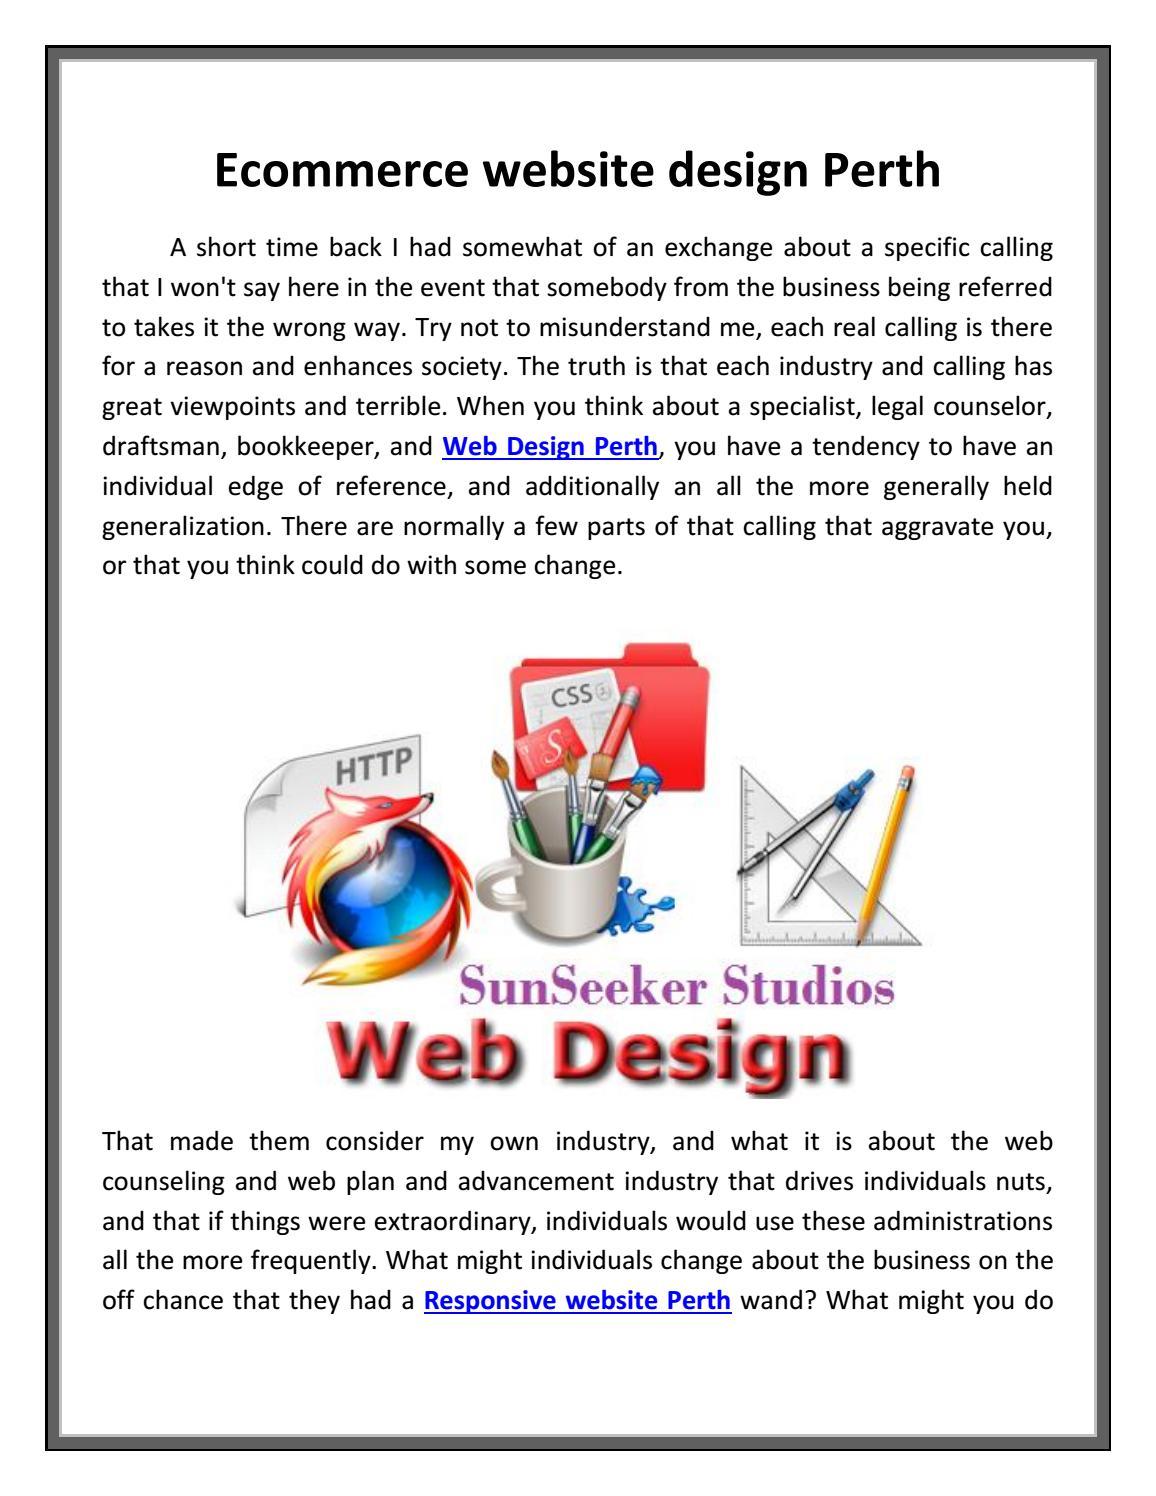 Ecommerce website design perth sunseekerstudios by SunSeeker